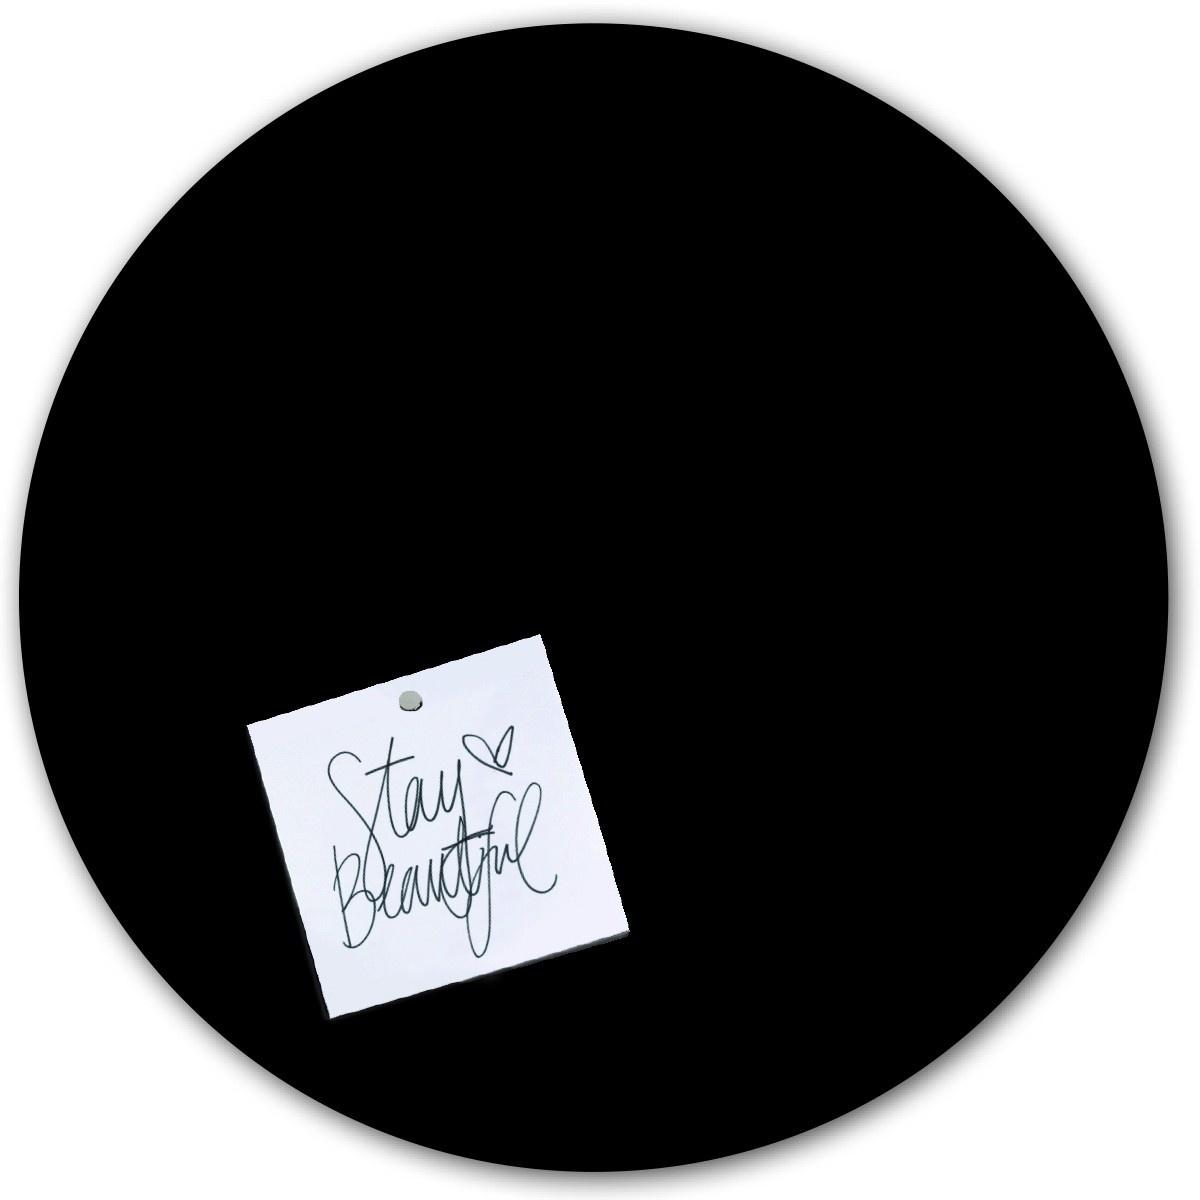 Groovy Magnets magneetsticker, krijtbordsticker, rond XL, zwart